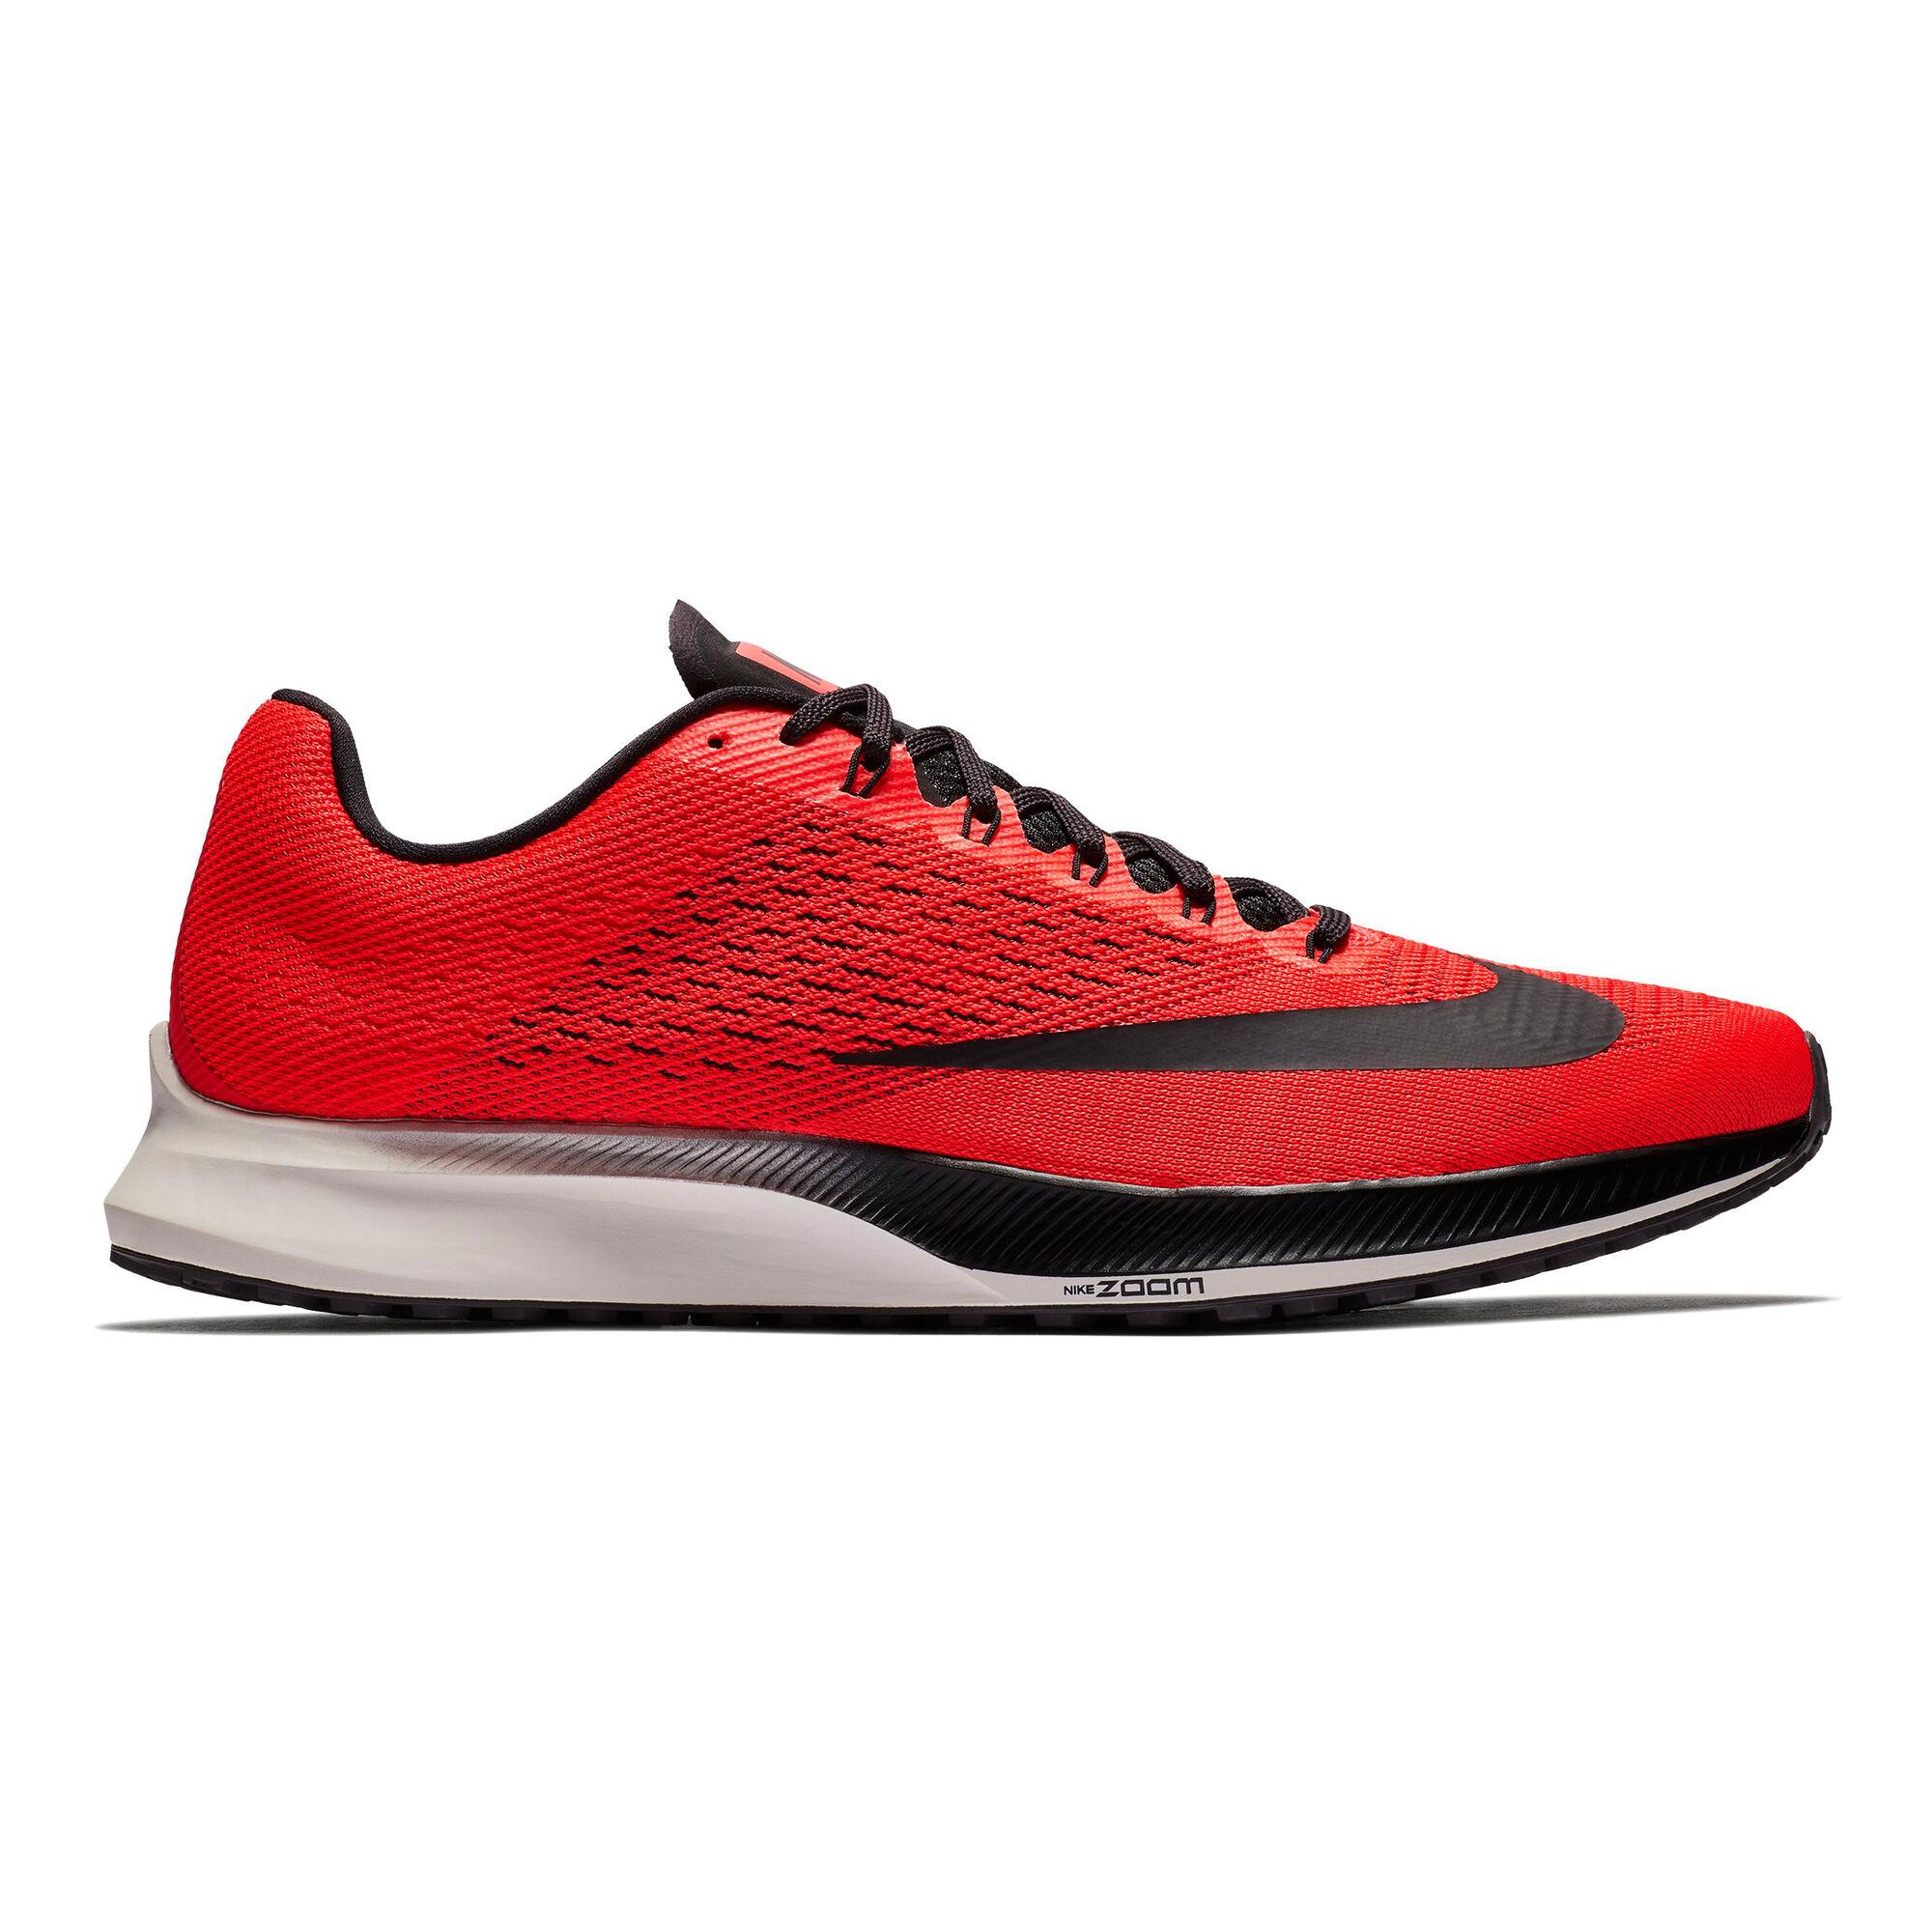 09c59a4617431 Nike  Nike  Nike  Nike  Nike  Nike  Nike  Nike. Air Zoom Elite 10 Men ...